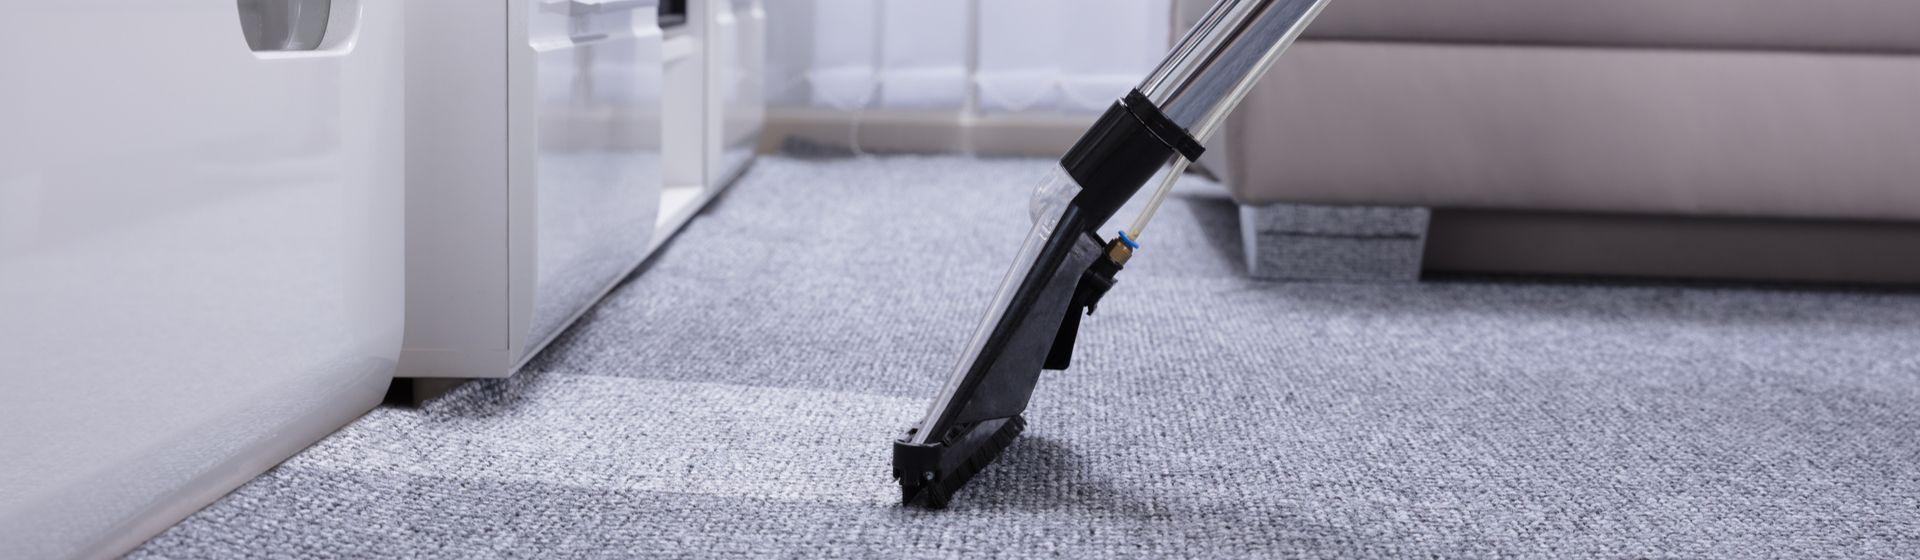 Extratora WAP Comfort Cleaner Pro 2000W: confira a análise do modelo